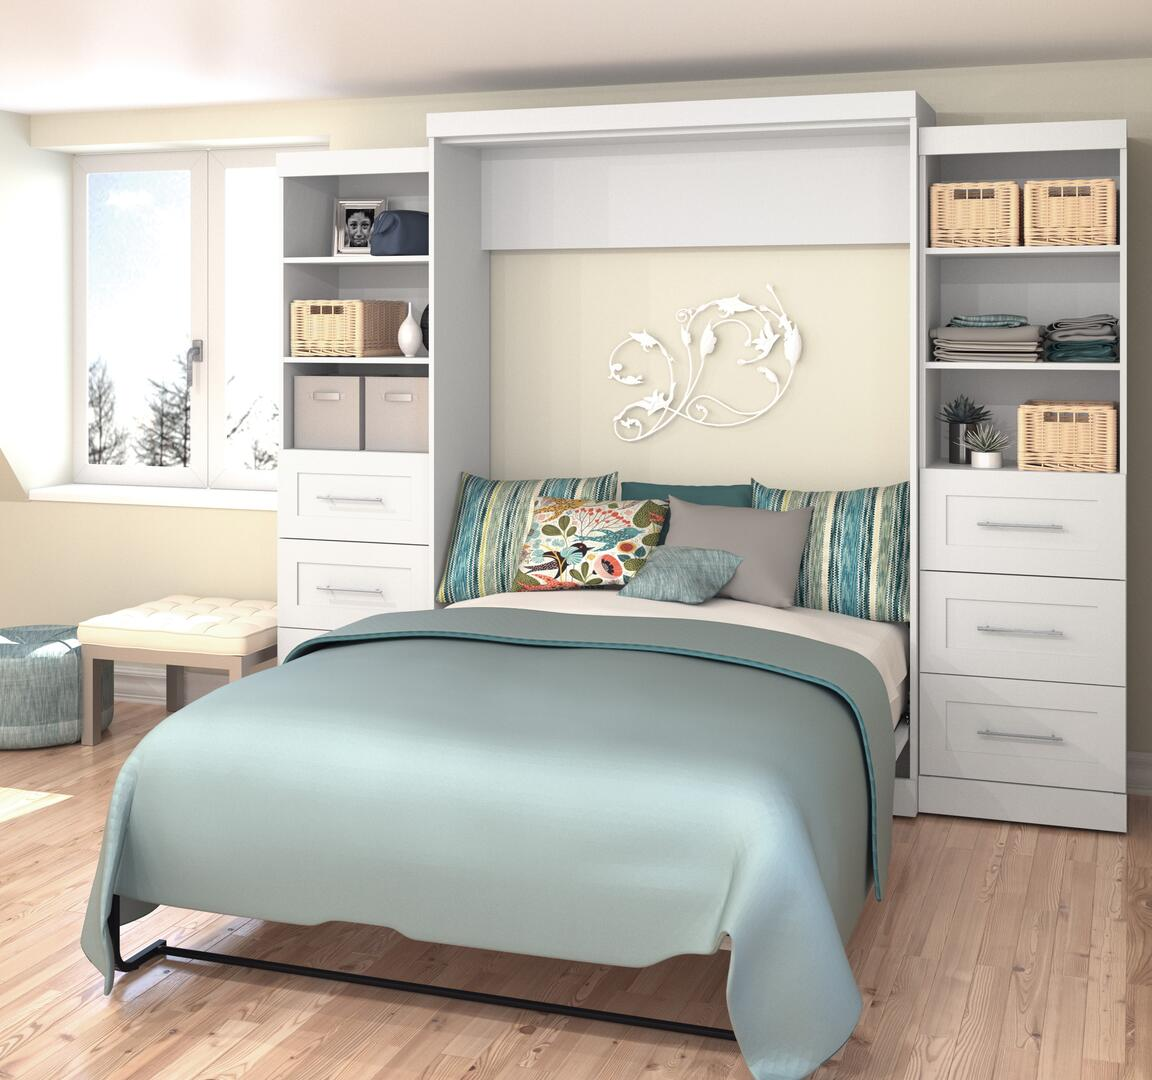 Bestar Furniture 2688417 Pur Series Queen Size Murphy Bed ...